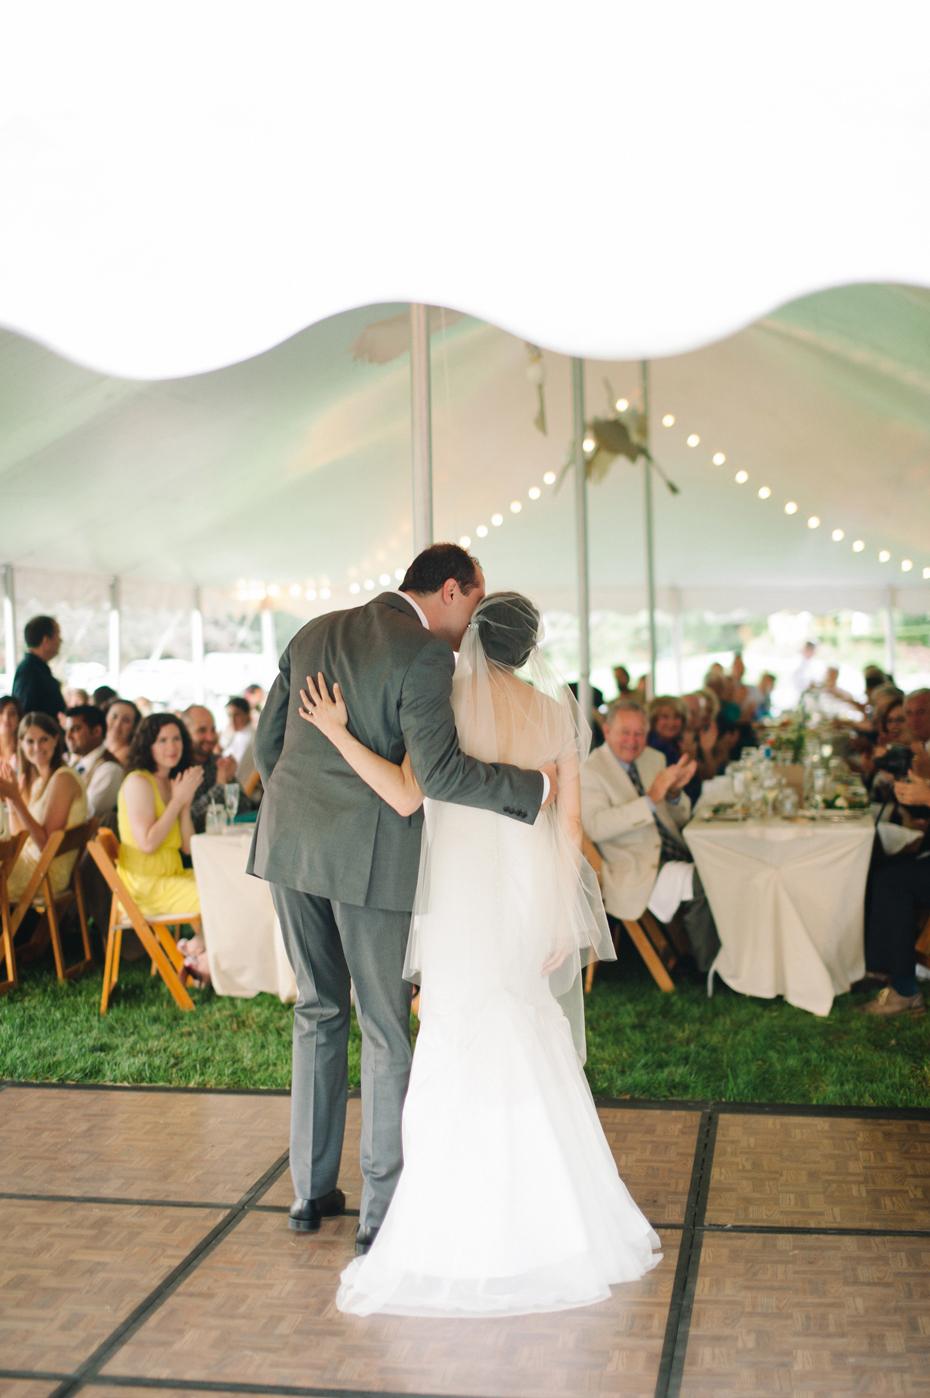 bride and groom share their first dance at their backyard wedding reception by Ann Arbor Michigan wedding photographer, Heather Jowett.